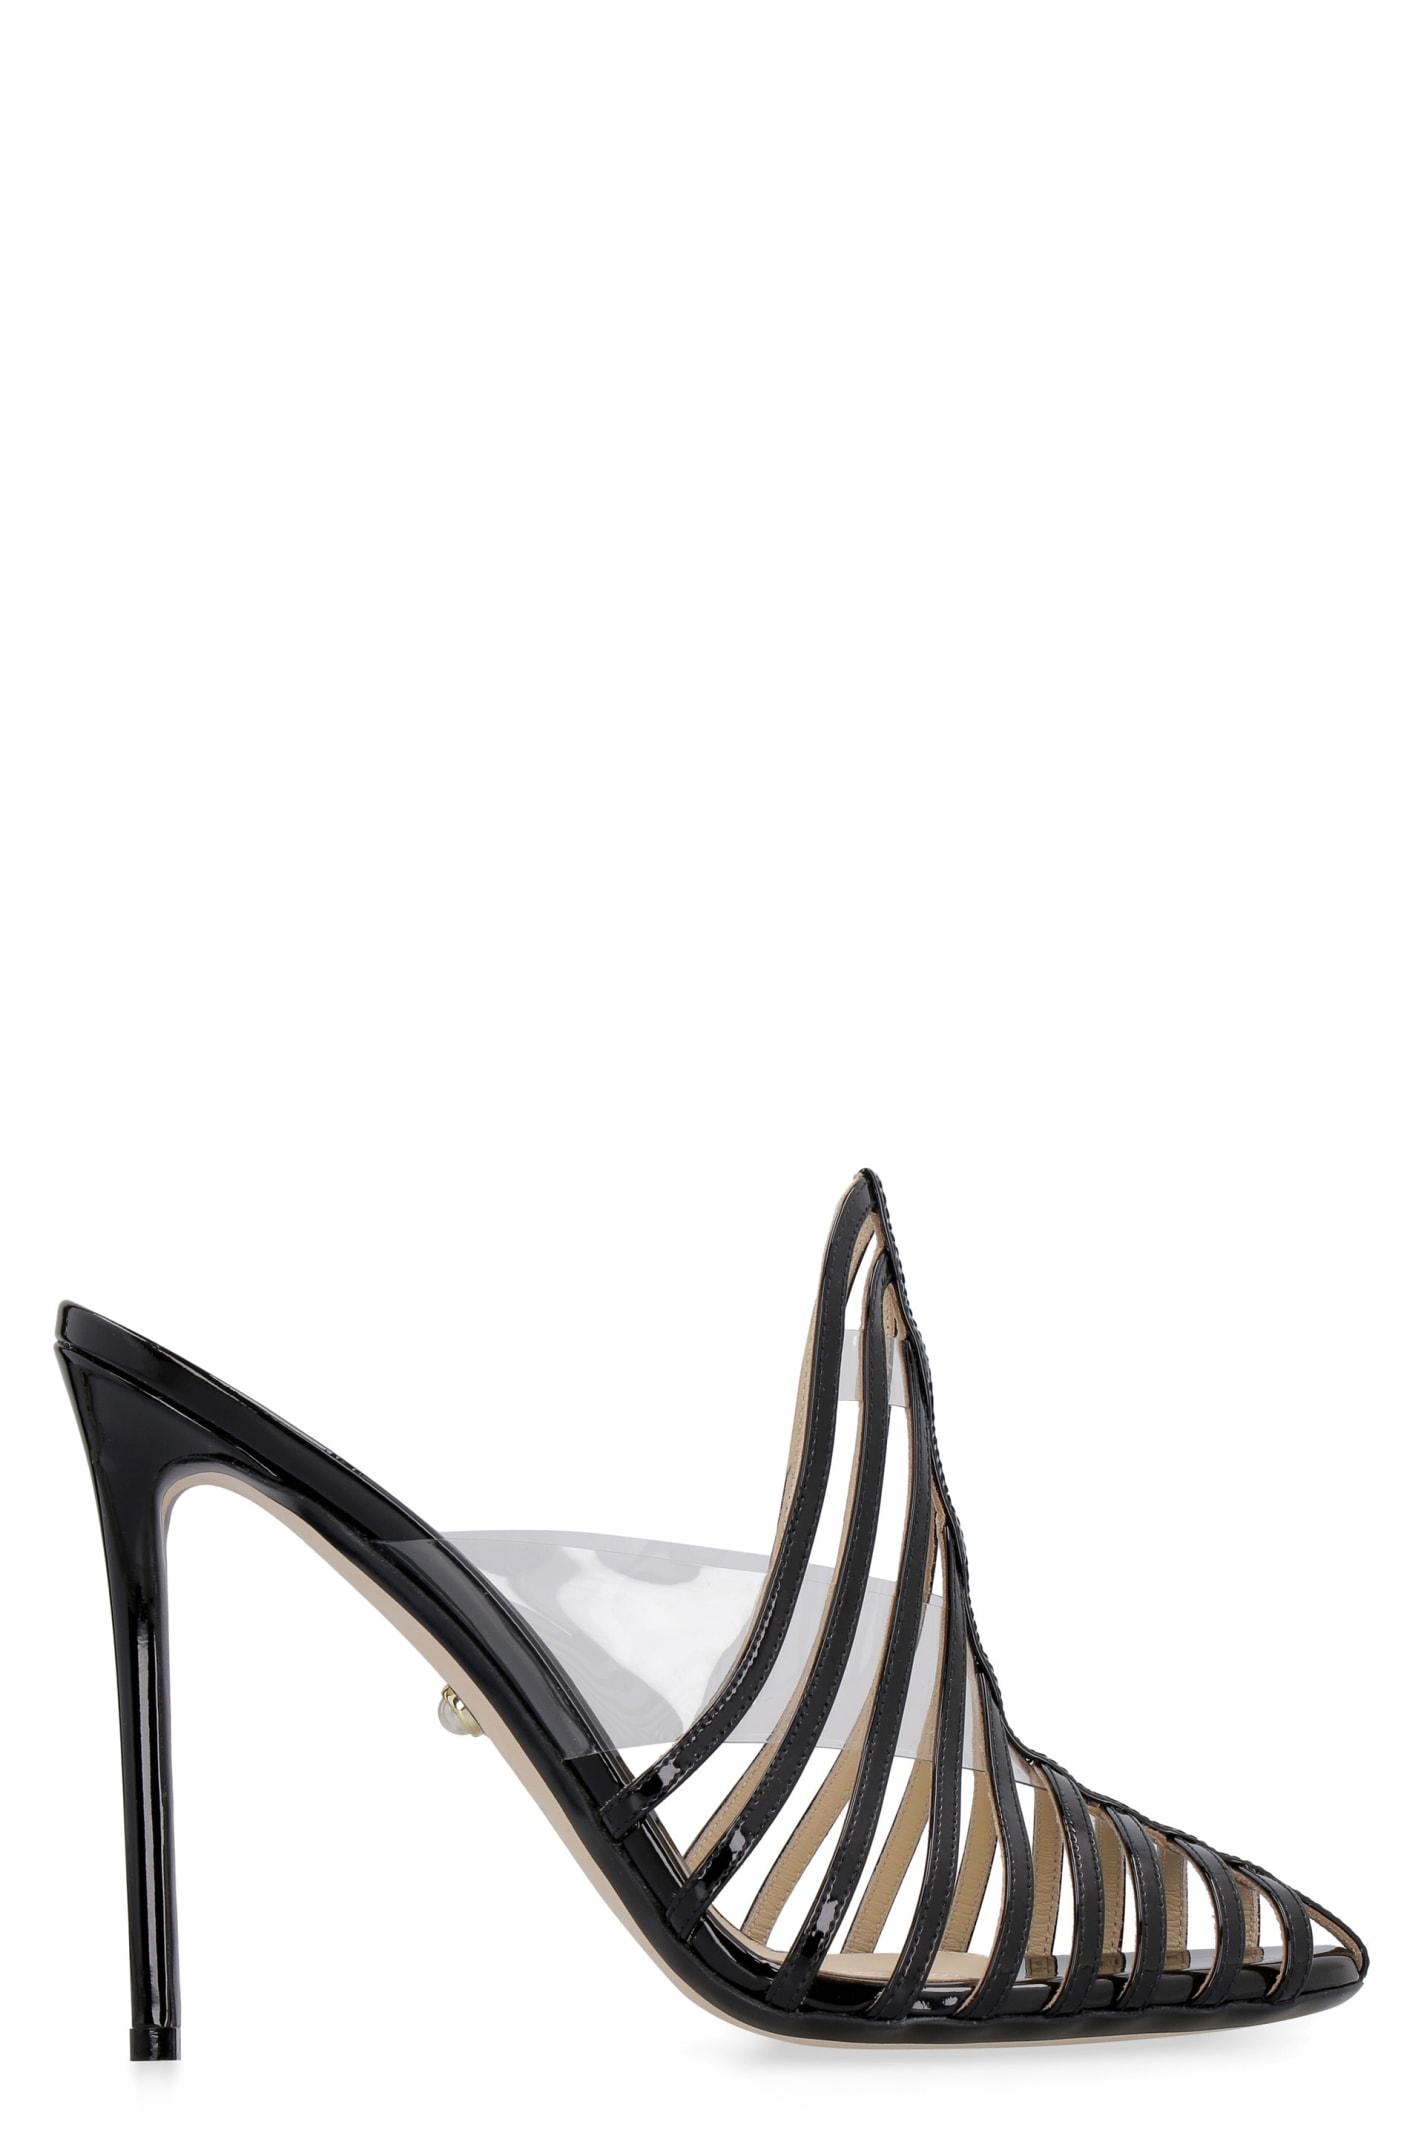 Alessandra Patent Leather Sandals